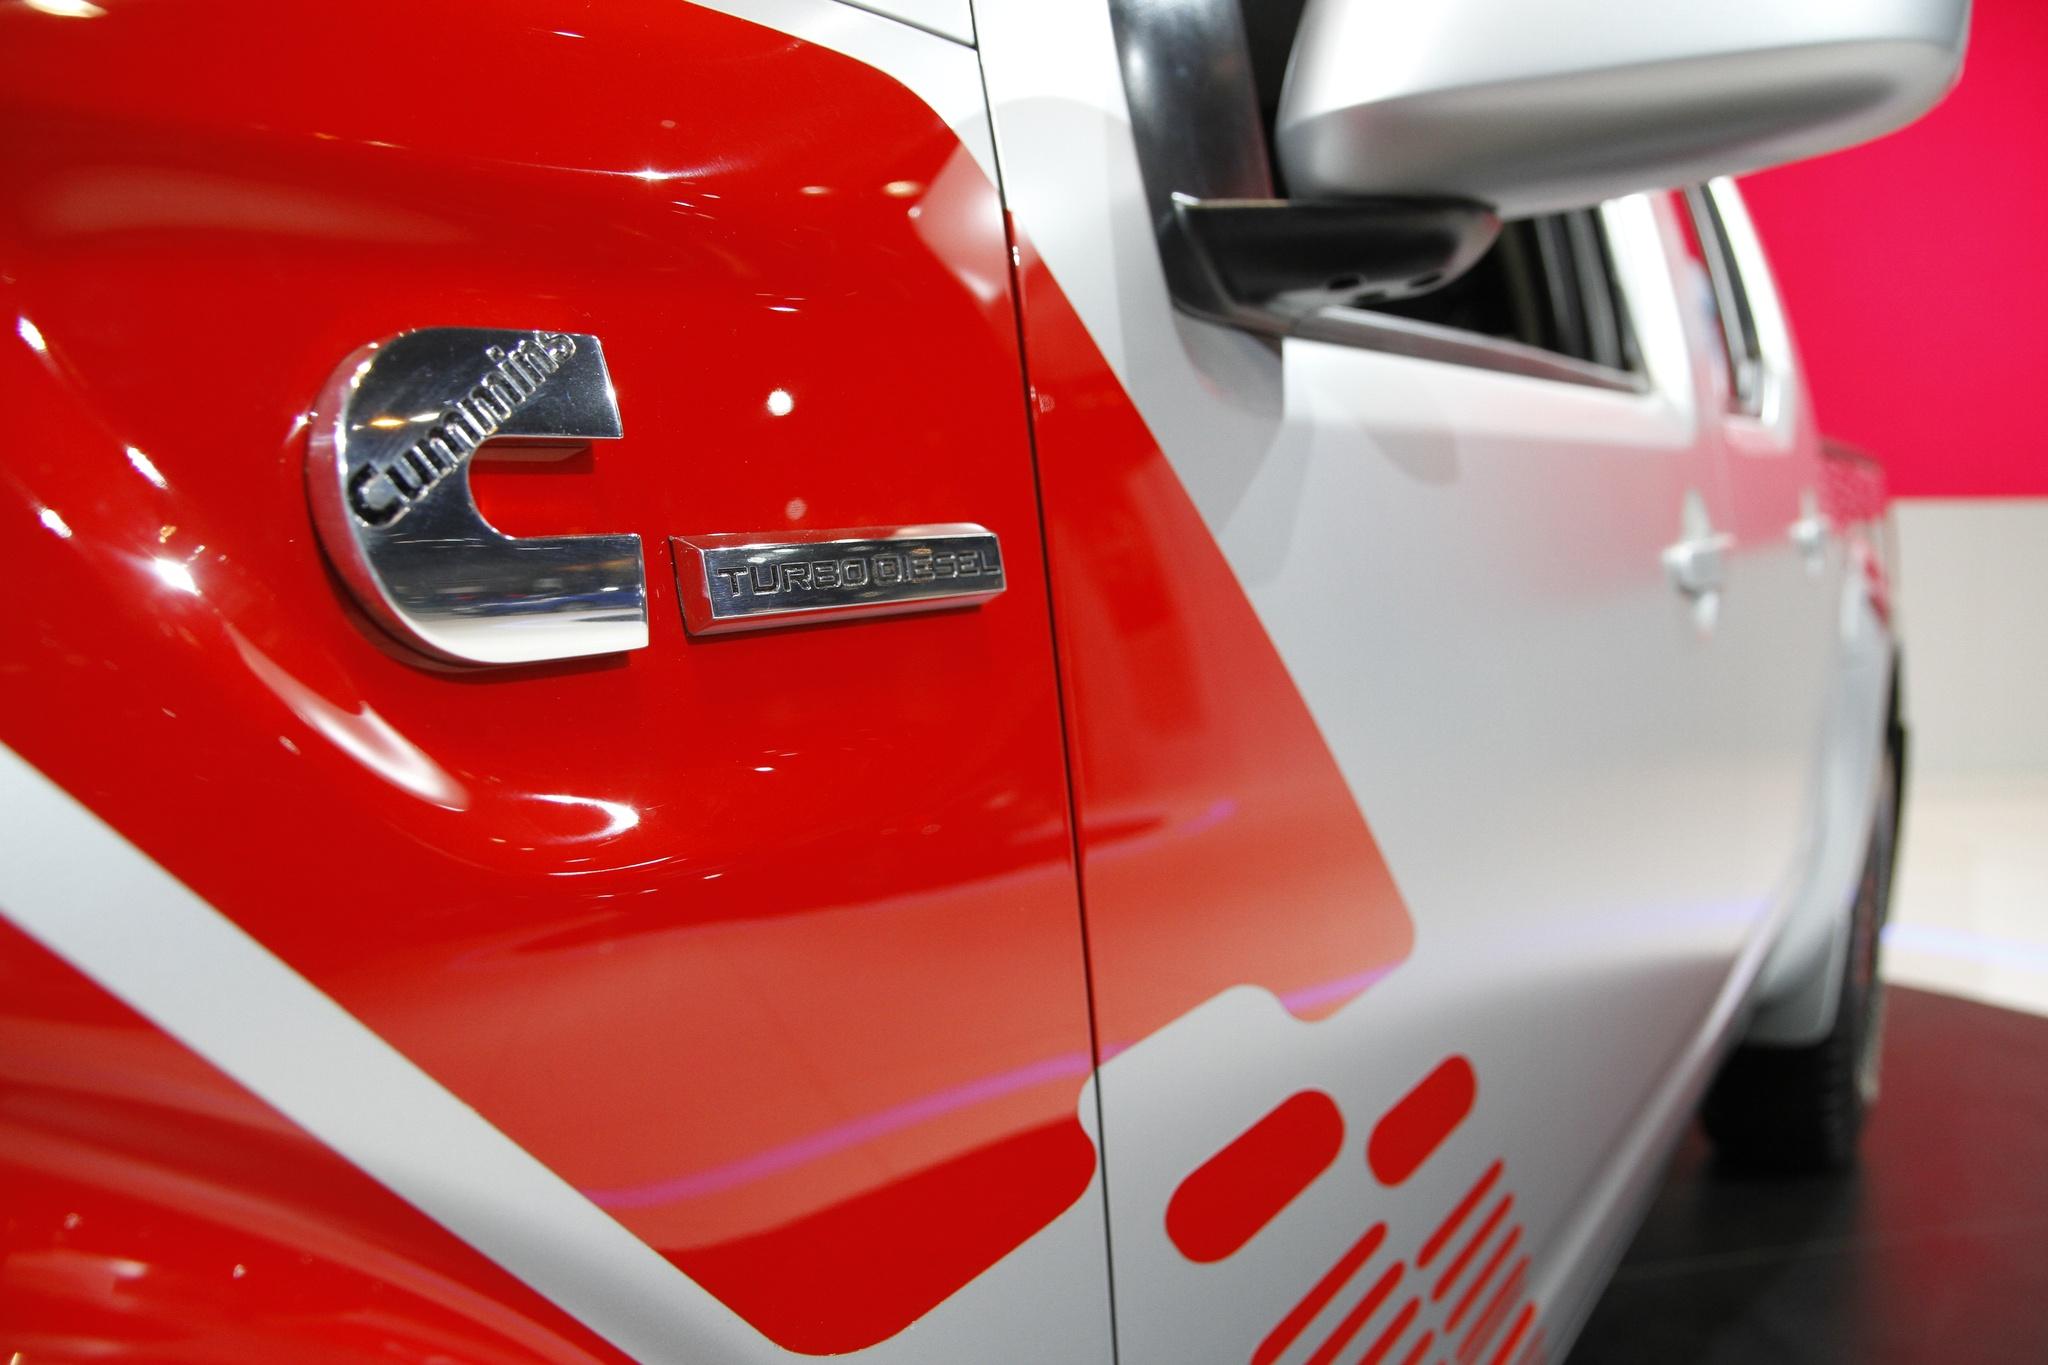 Engine-maker Cummins voluntarily recalls 500K trucks over faulty part